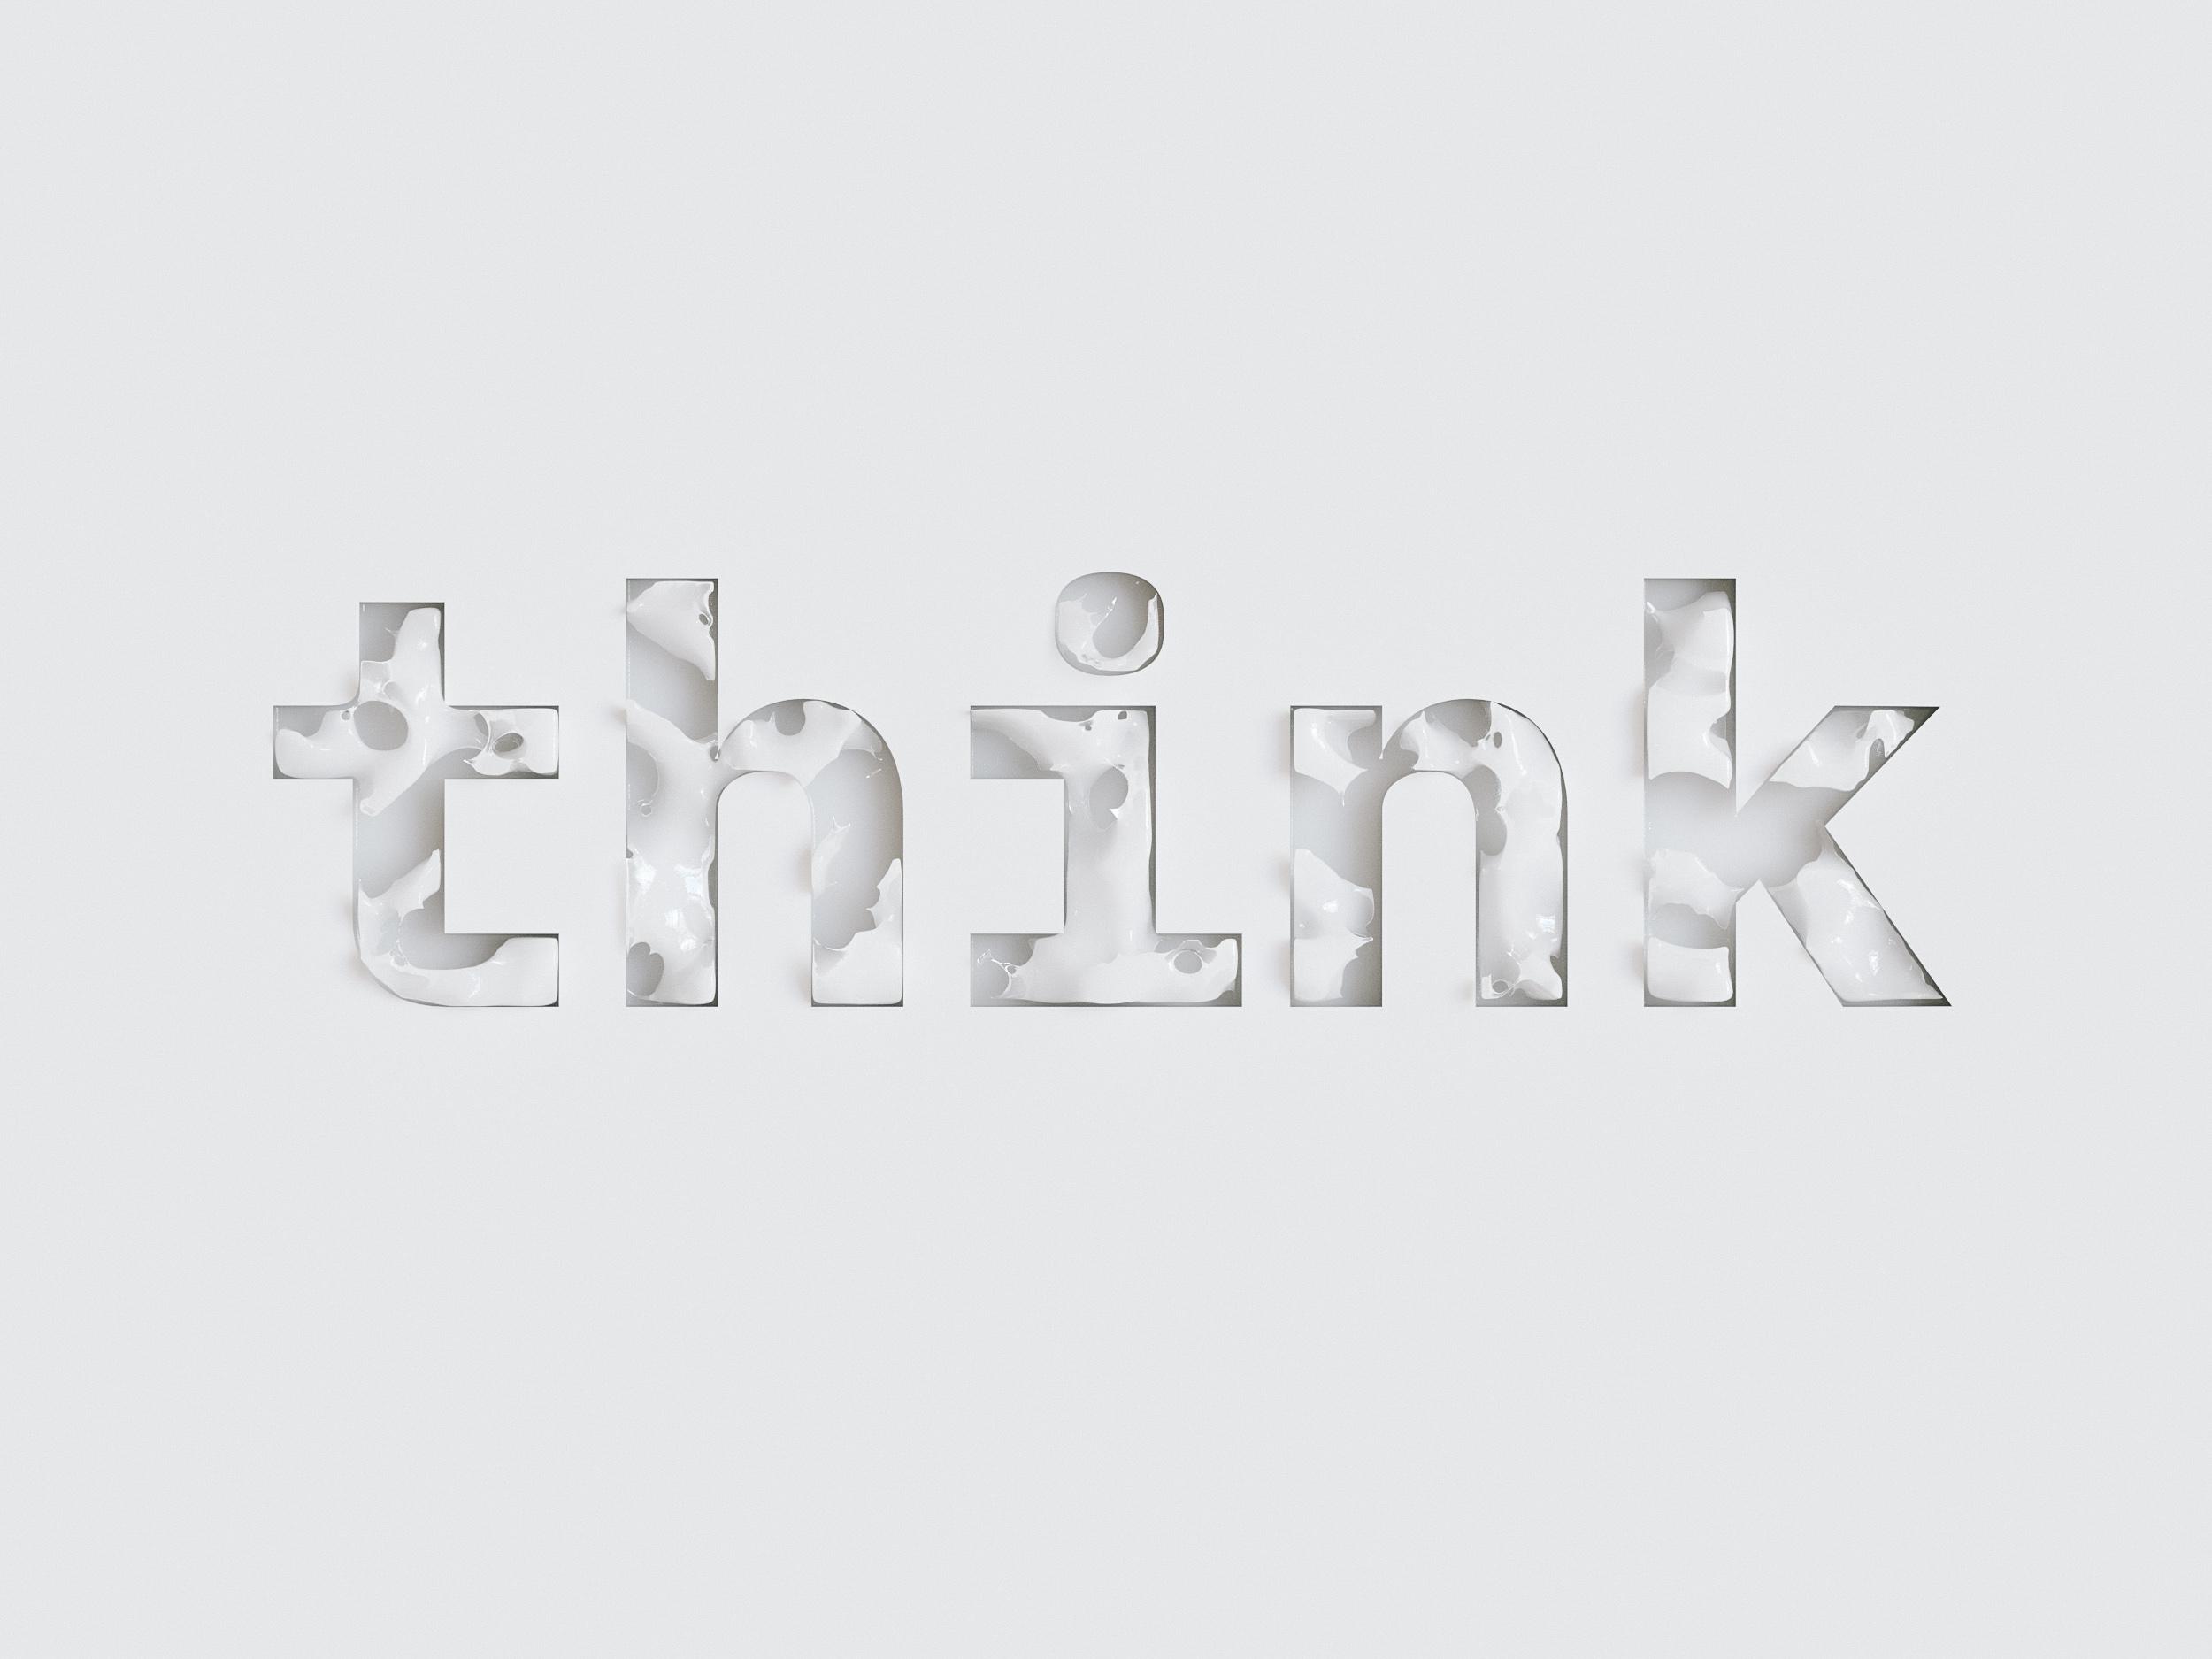 Think_Type_001_hek_062_OctaneCamera_1.jpg